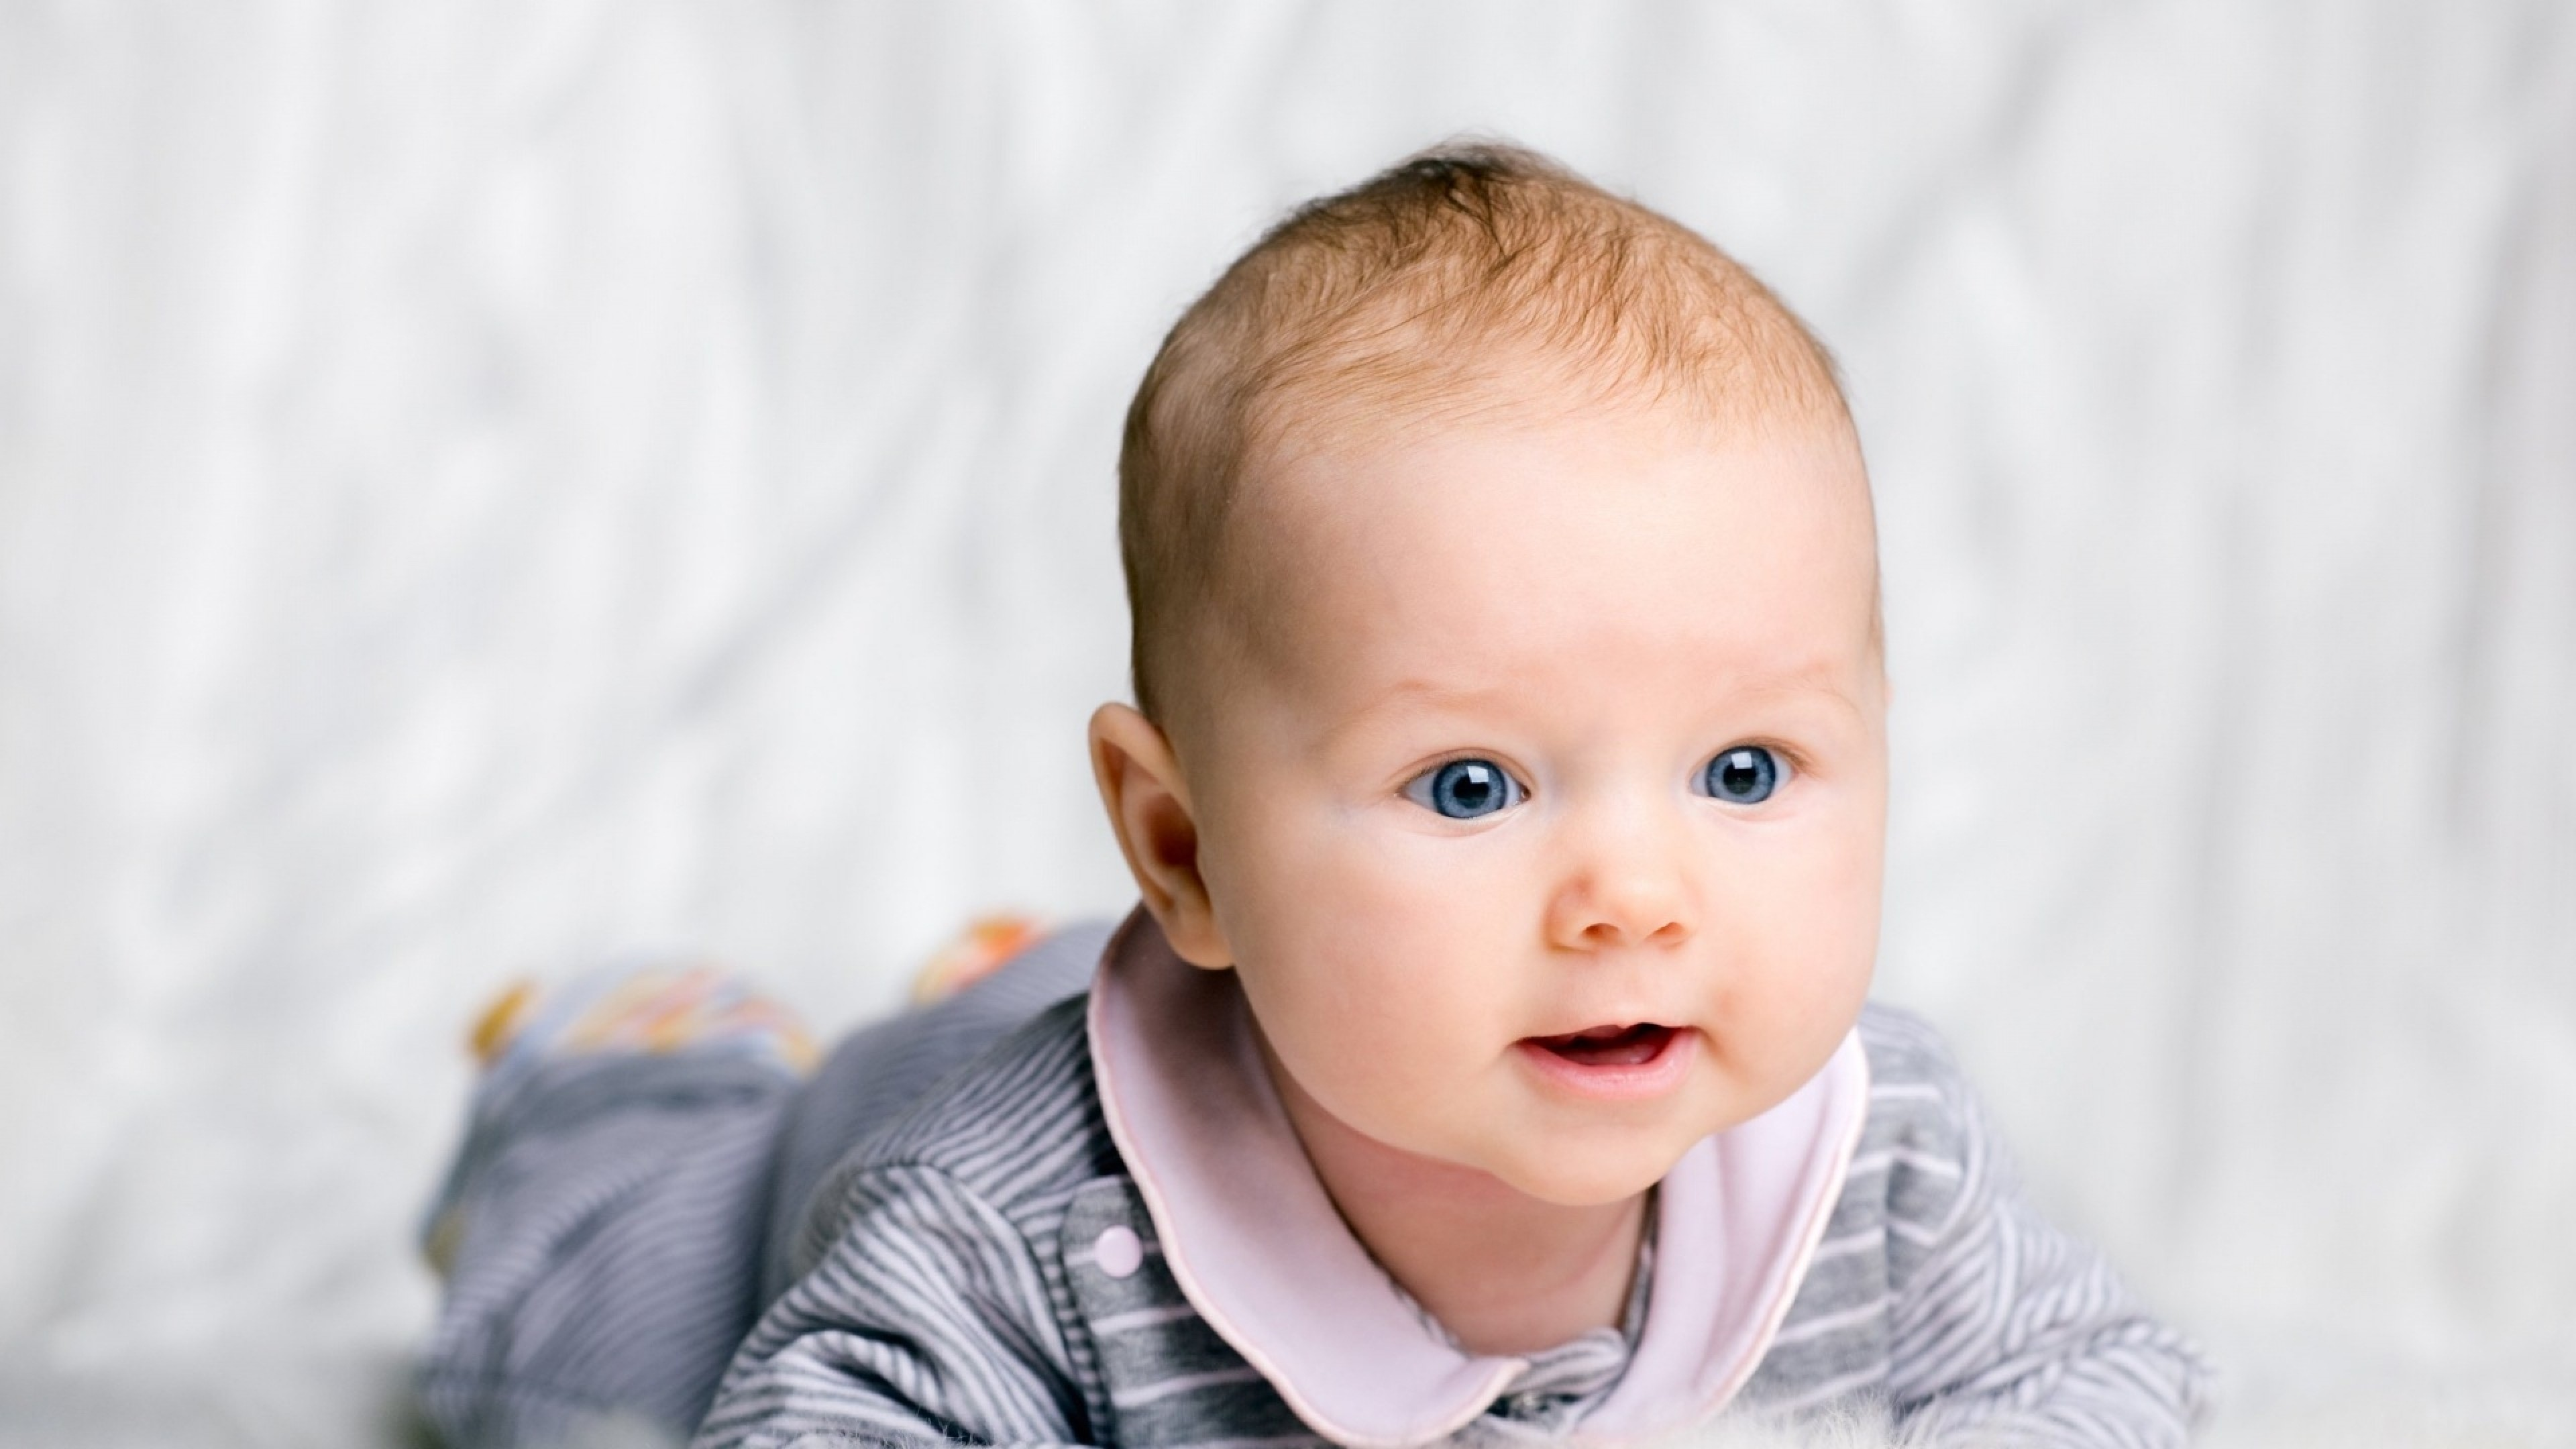 Beautiful Baby Boy Hd Wallpaper Wallpapers Trend